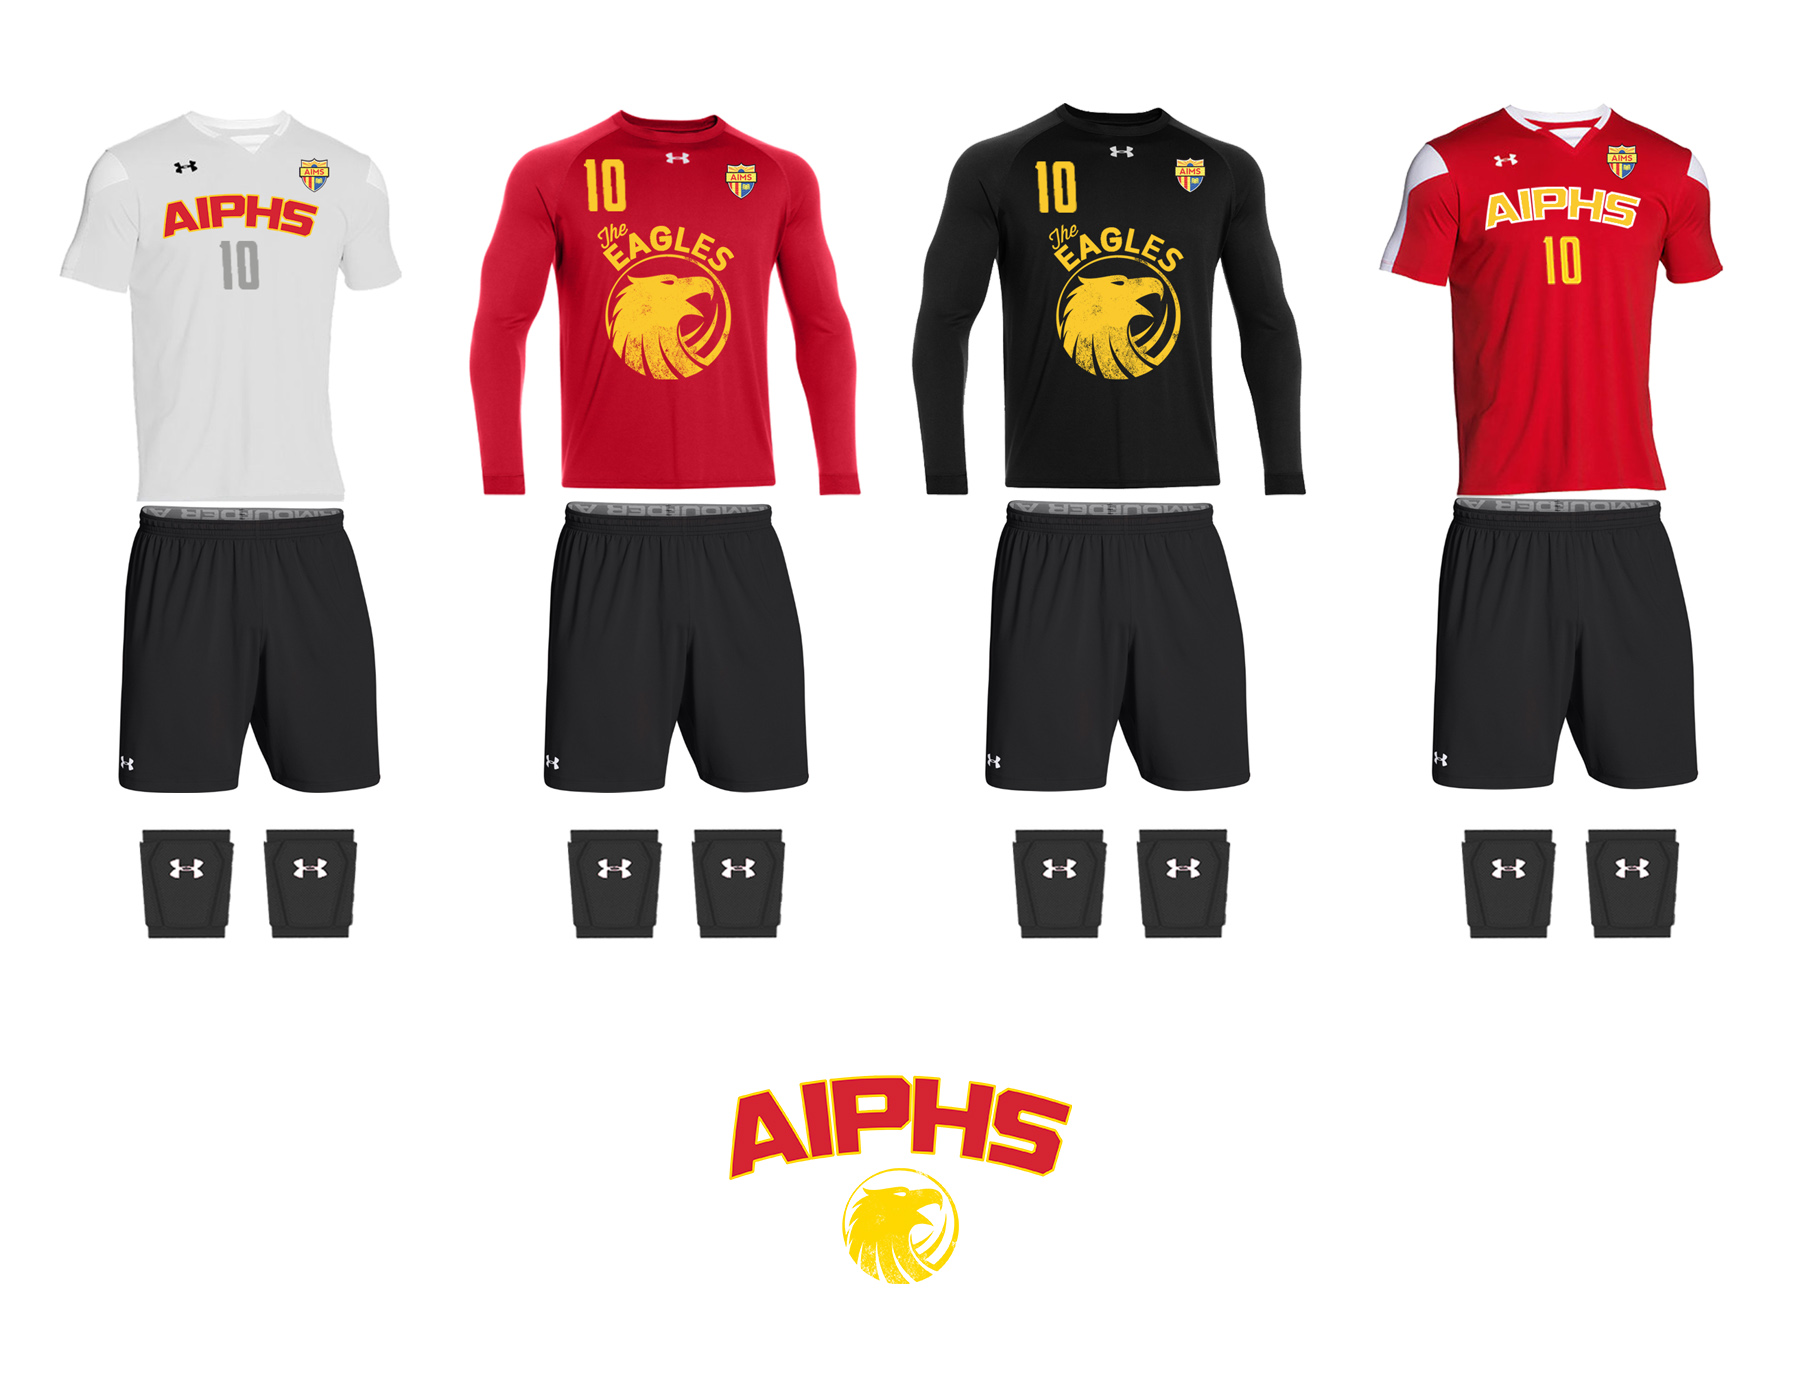 AIPHS Boys Volleyball